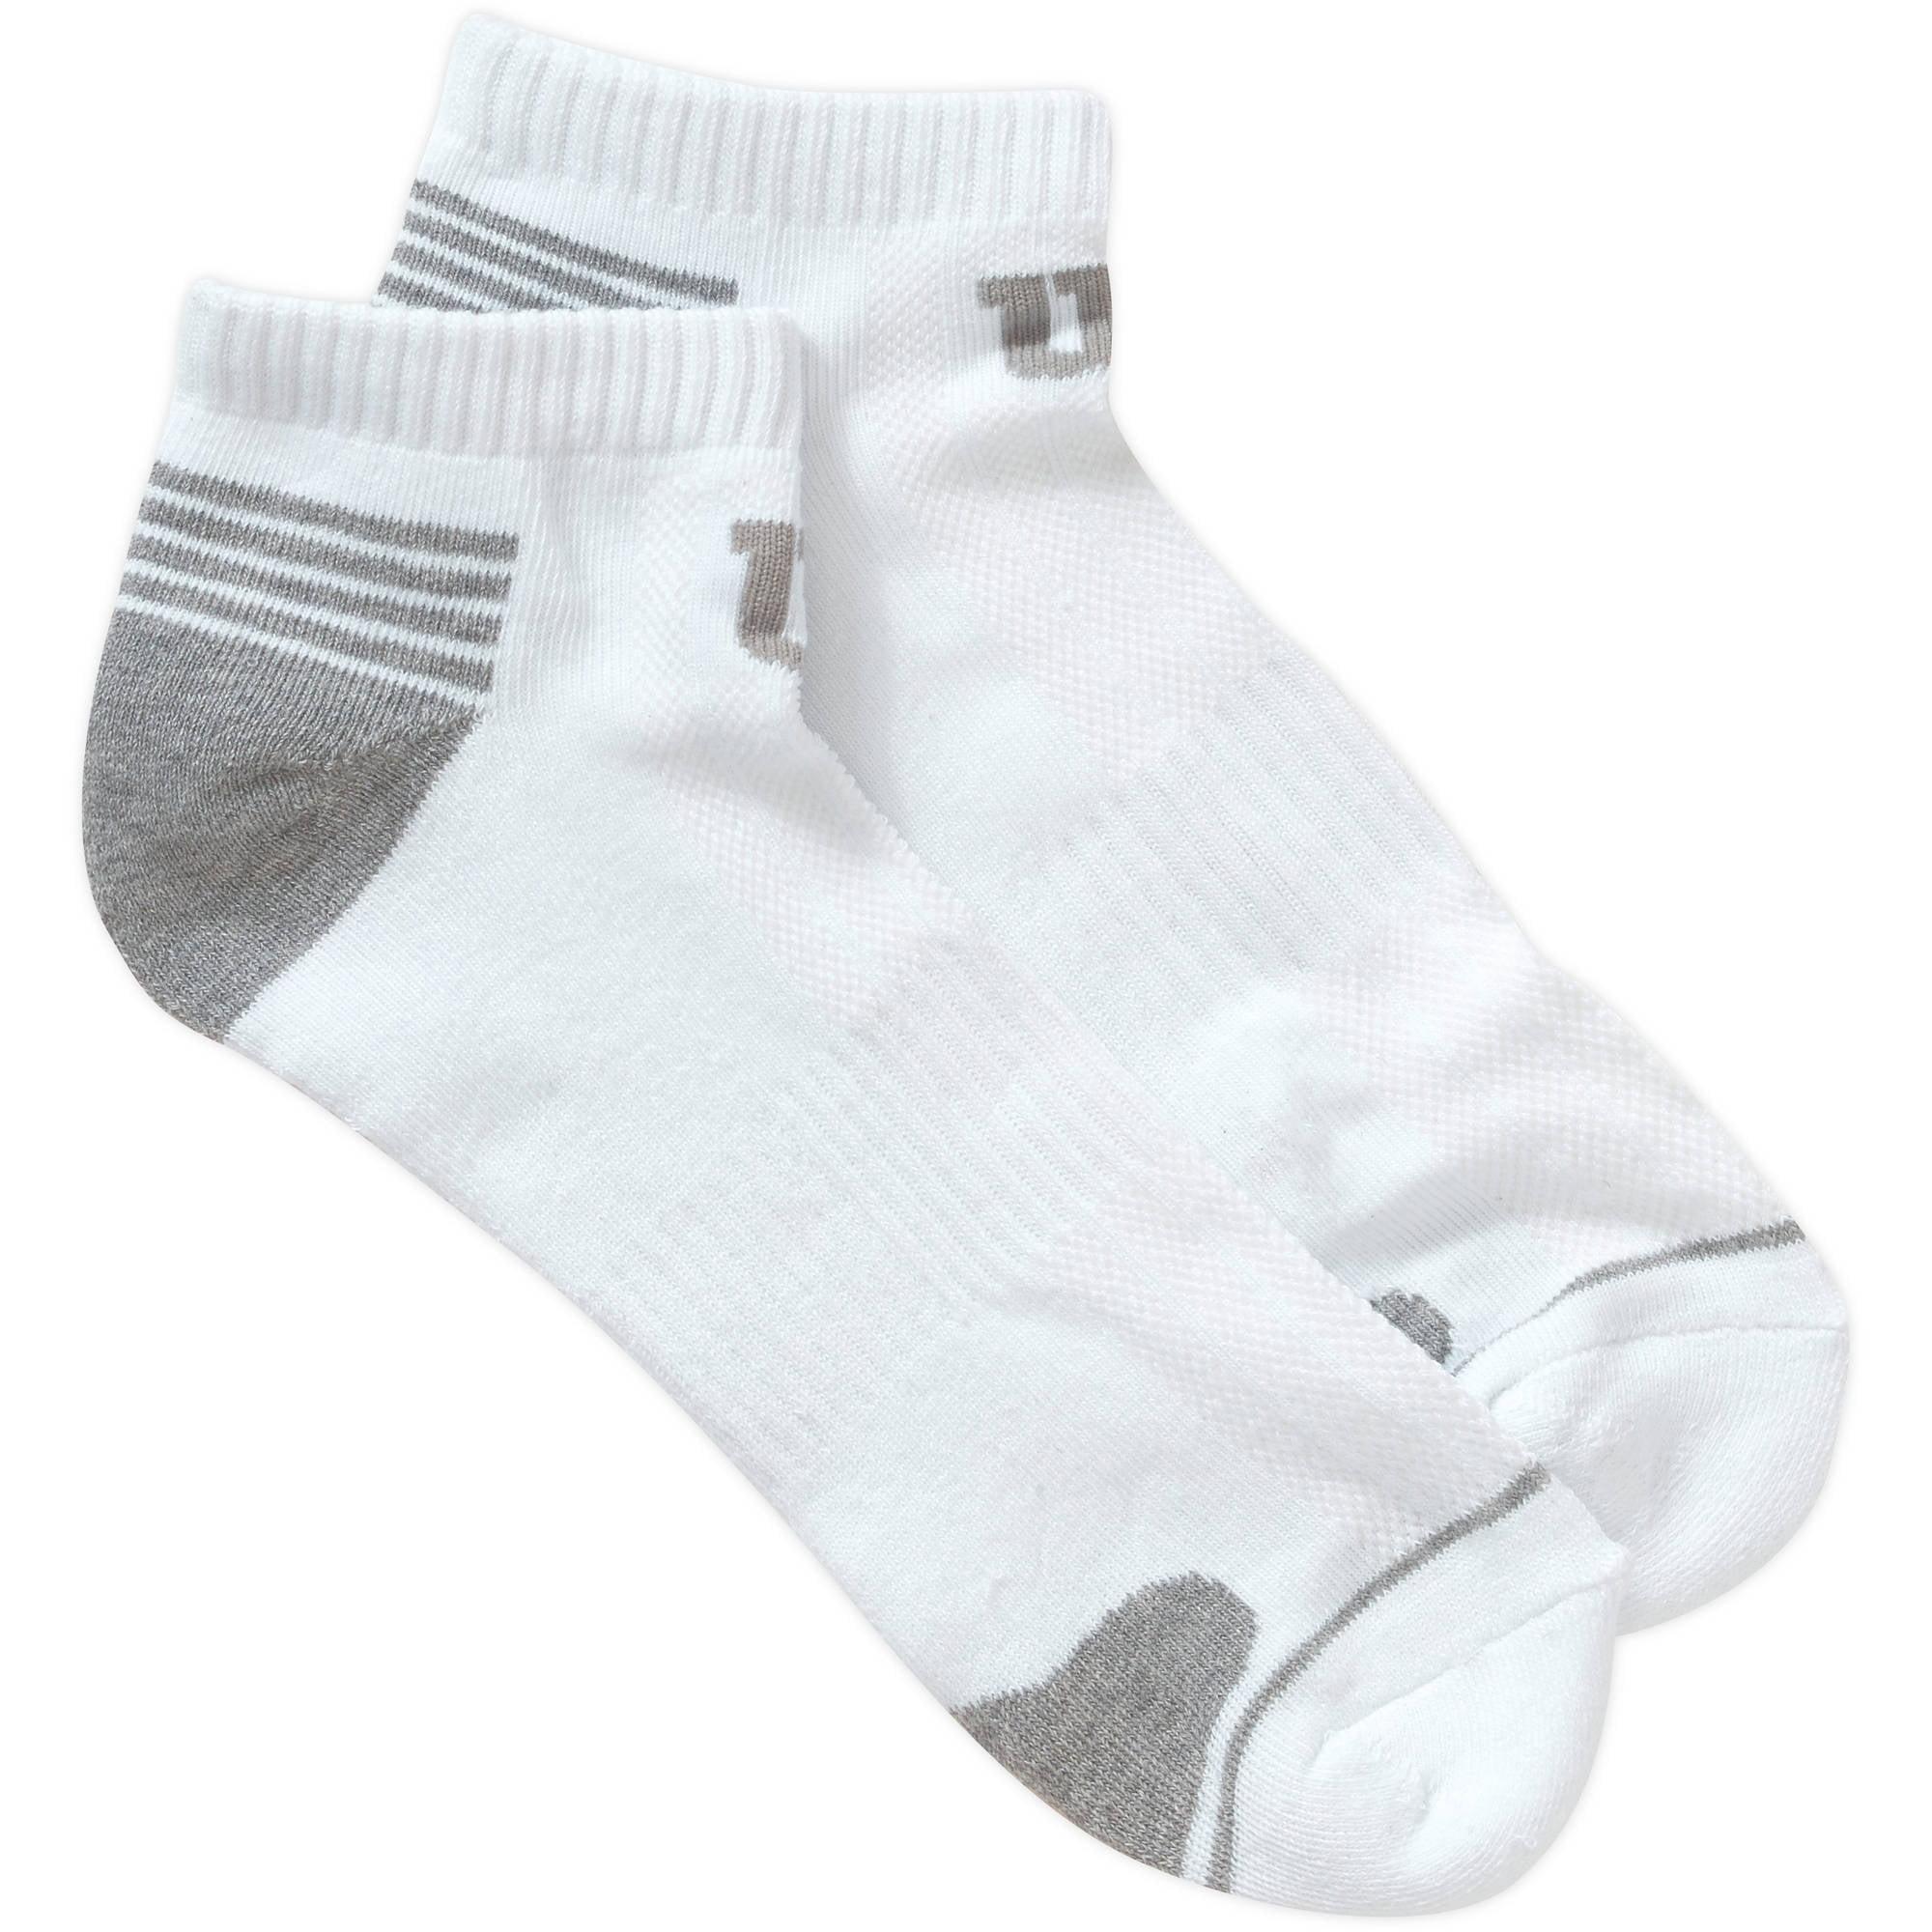 Wilson - Wilson Men s Performance No Show Socks 6-Pack - Walmart.com cf286e8794